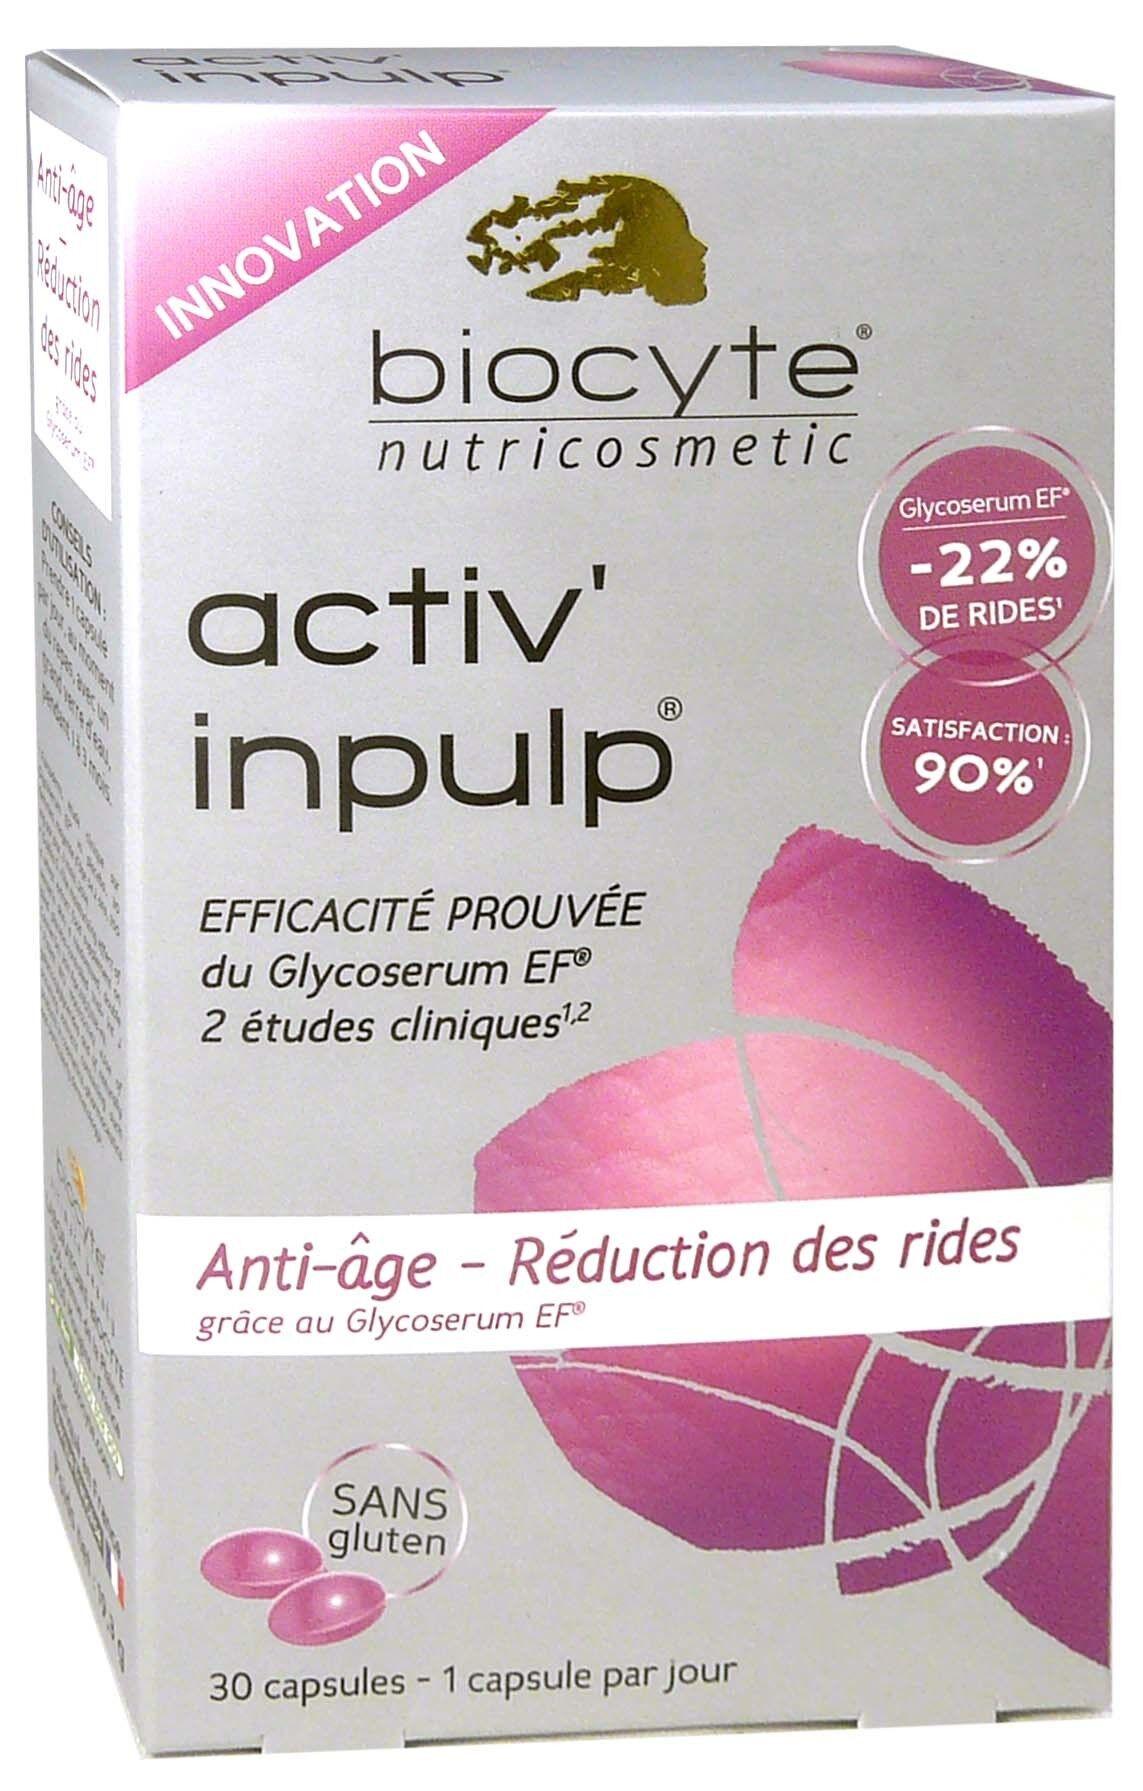 Biocyte activ inpulp anti-age boite 3 mois 3 x 30 capsules